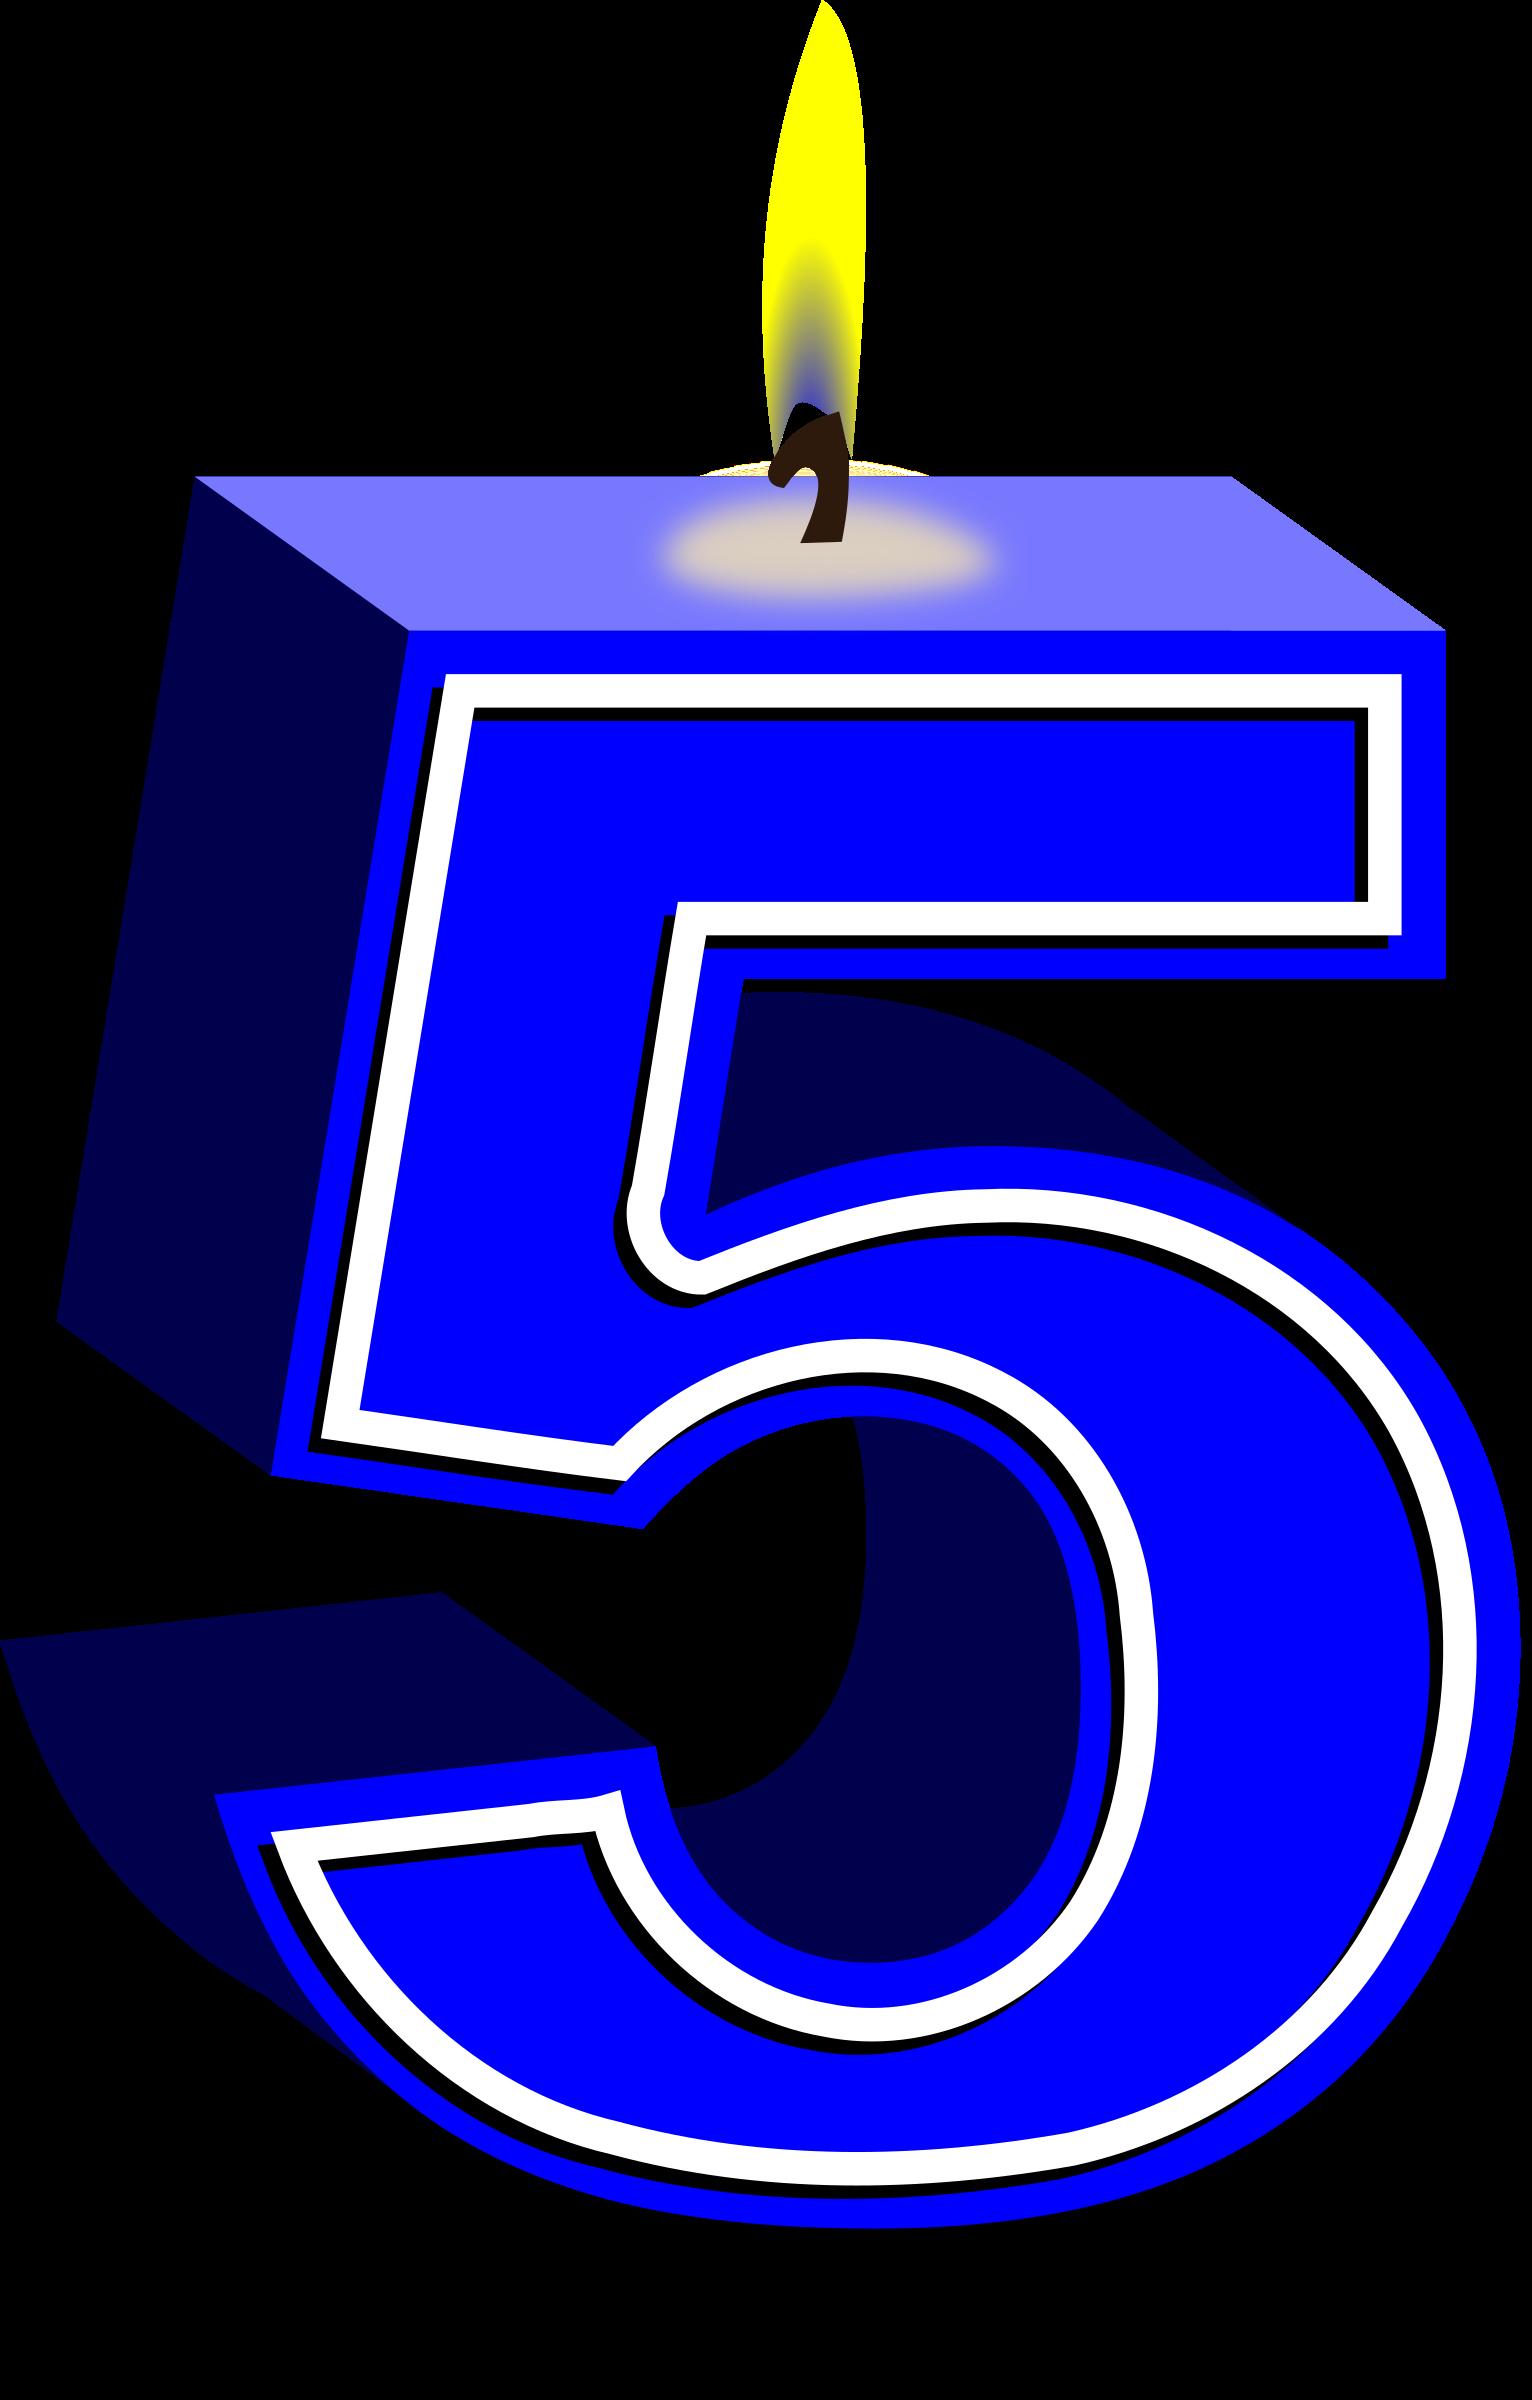 Clipart candle symbol. Birthday blue big image